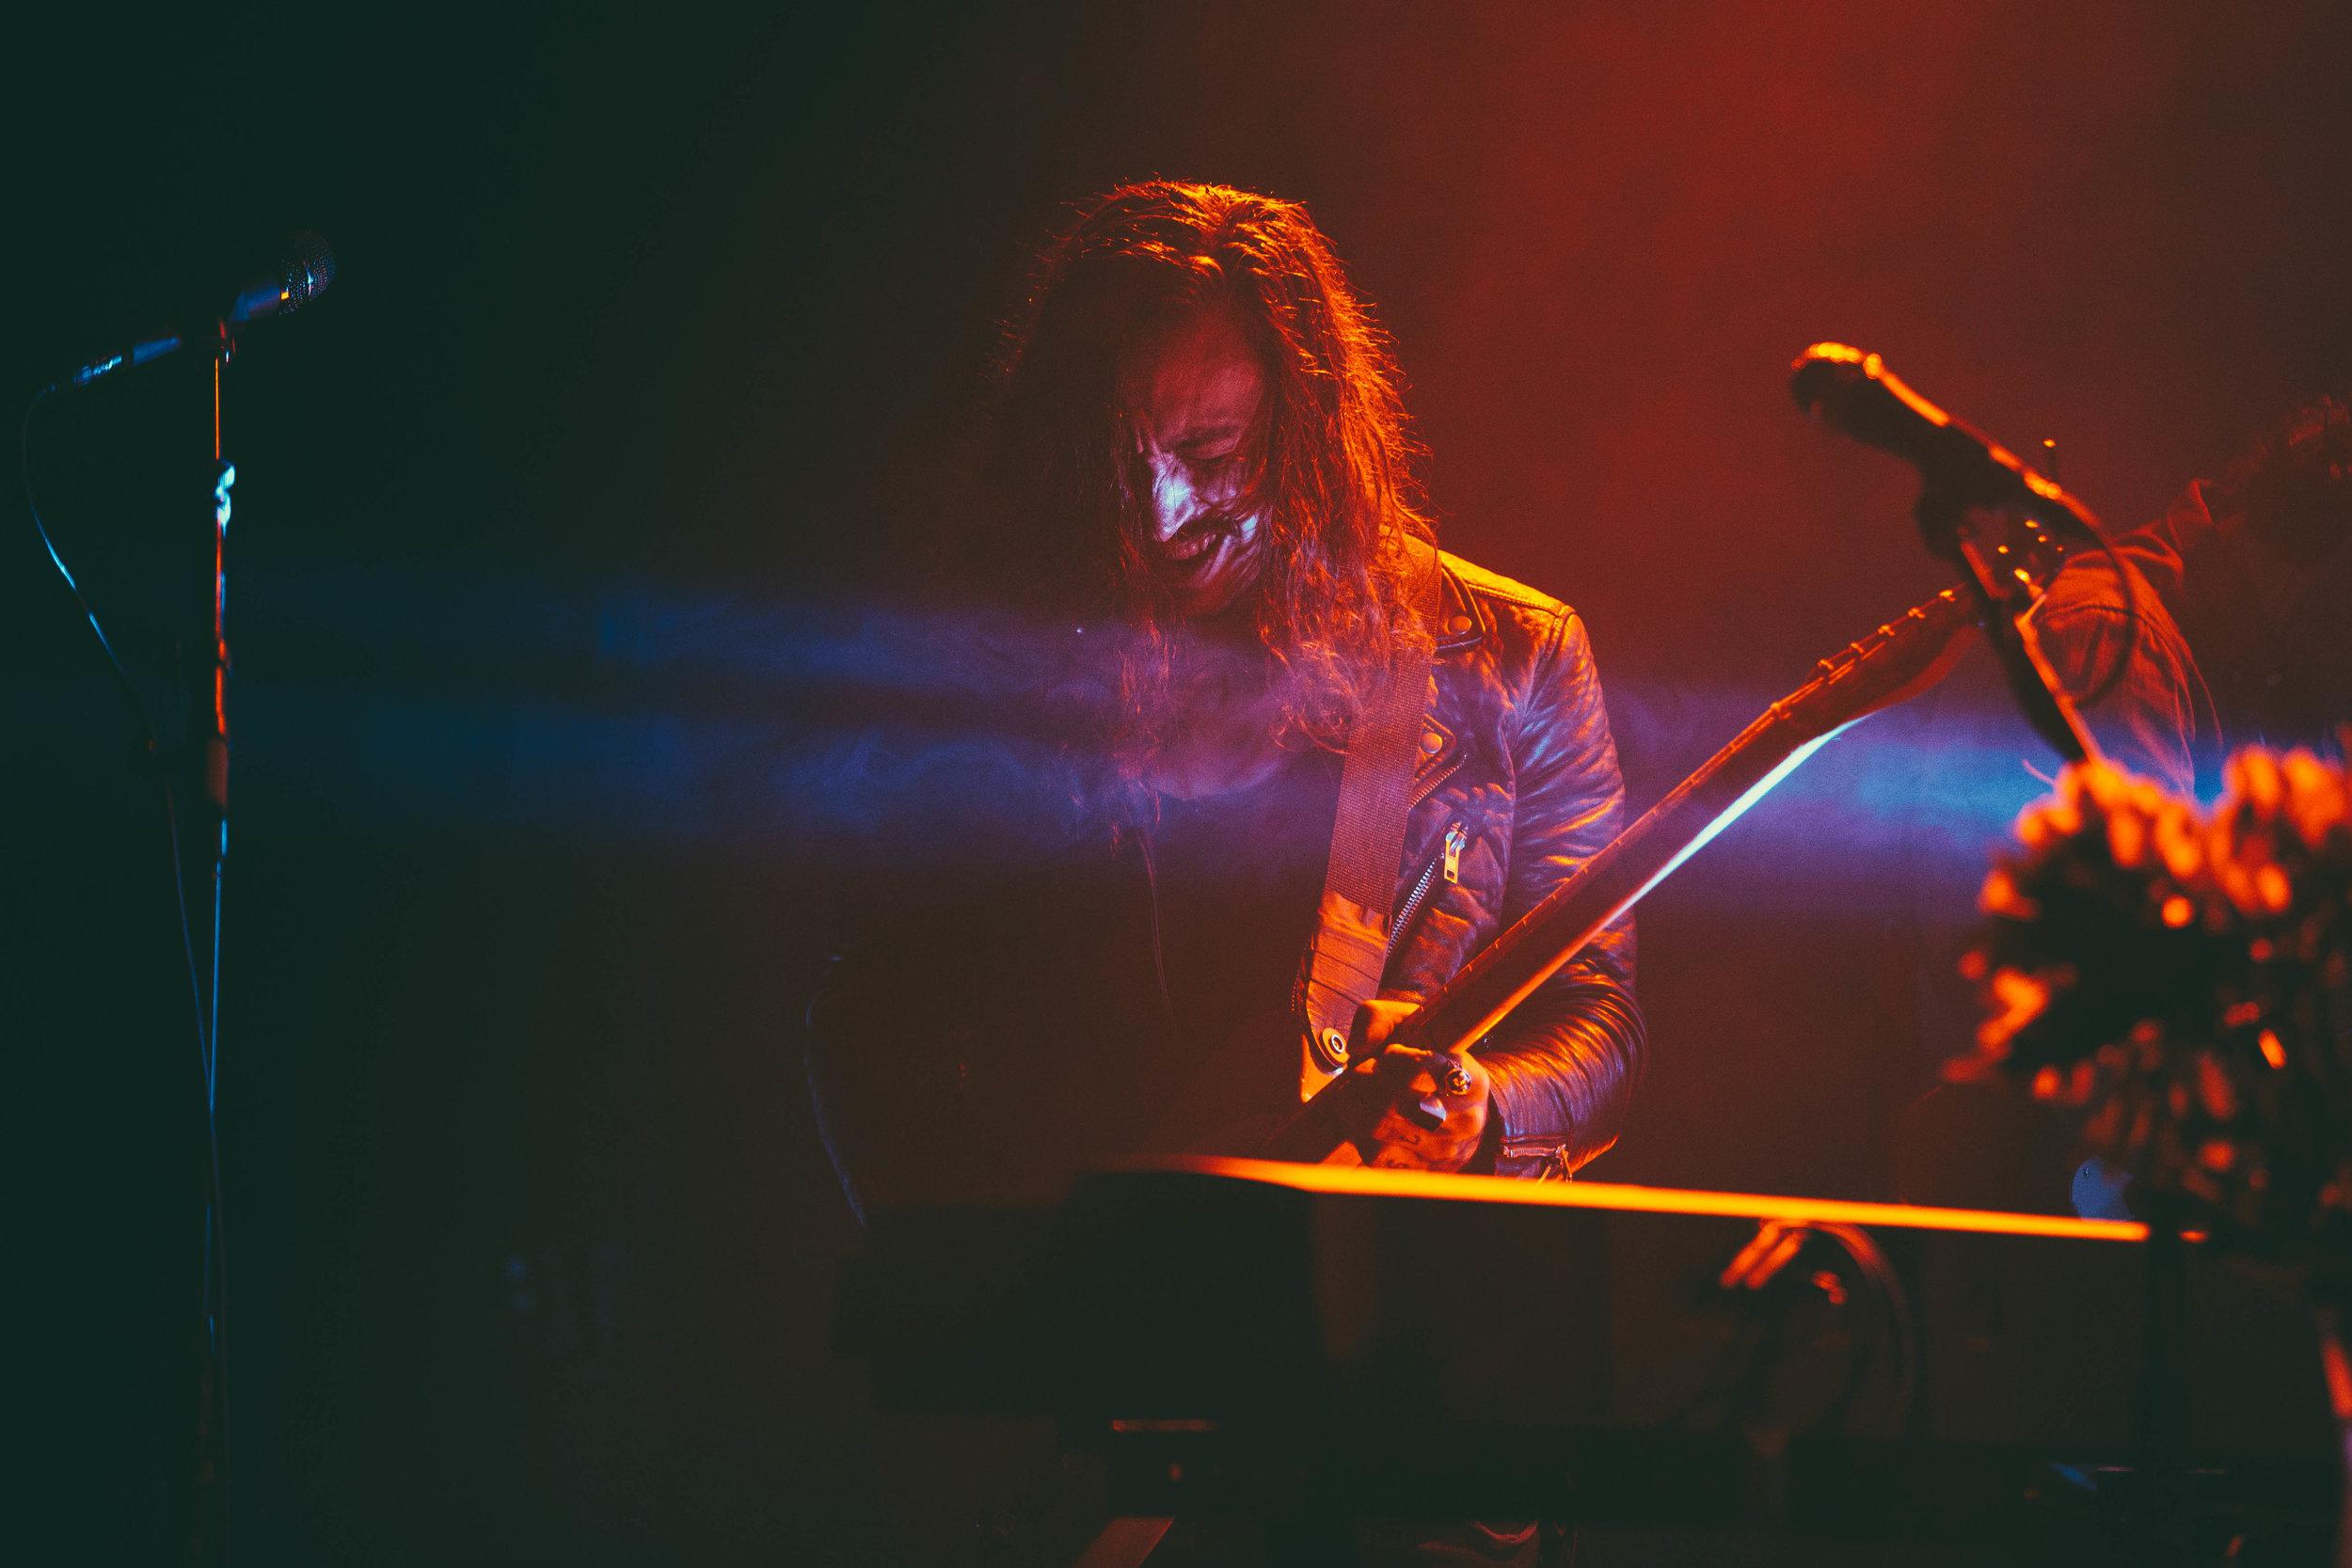 noah-gundersen-concert-el-rey-theatre-los-angeles-kirby-gladstein-2017-9